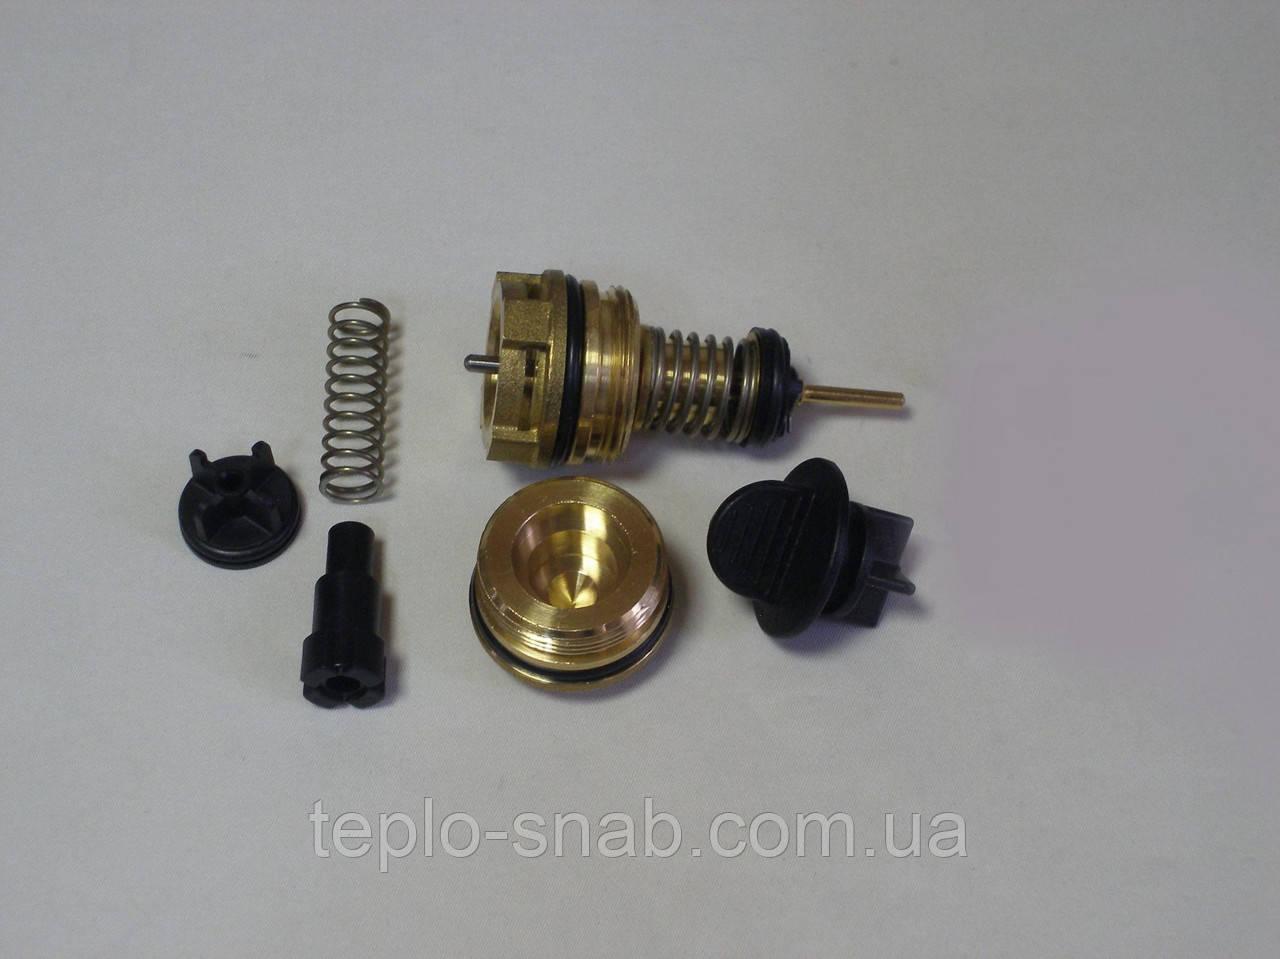 Ремкомплект 3-х ходового клапана Saunier Duval - S1006400